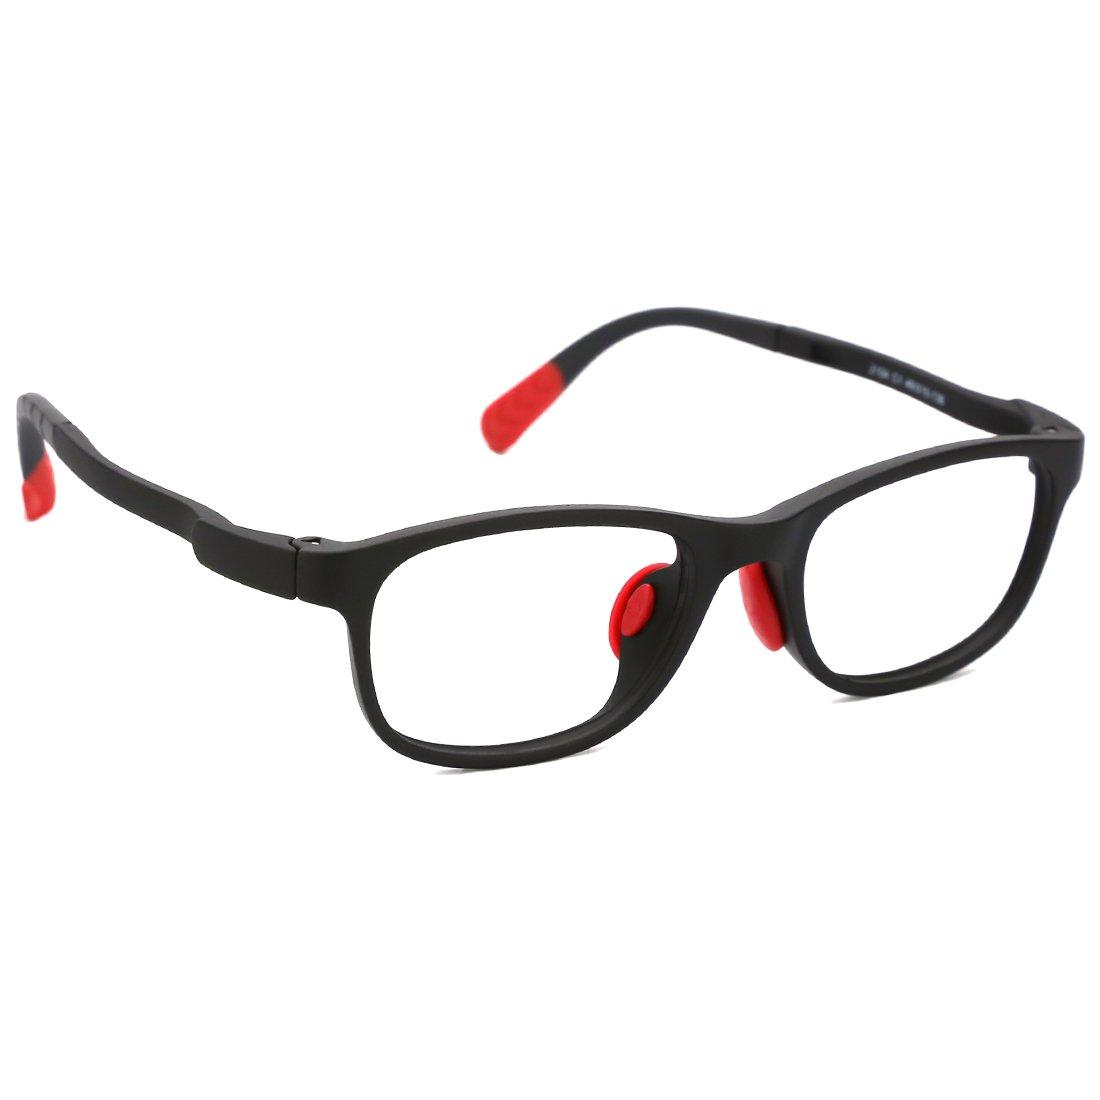 131a28eaf4 Amazon.com  modesoda Kids Non-Prescription Eyeglasses Frame